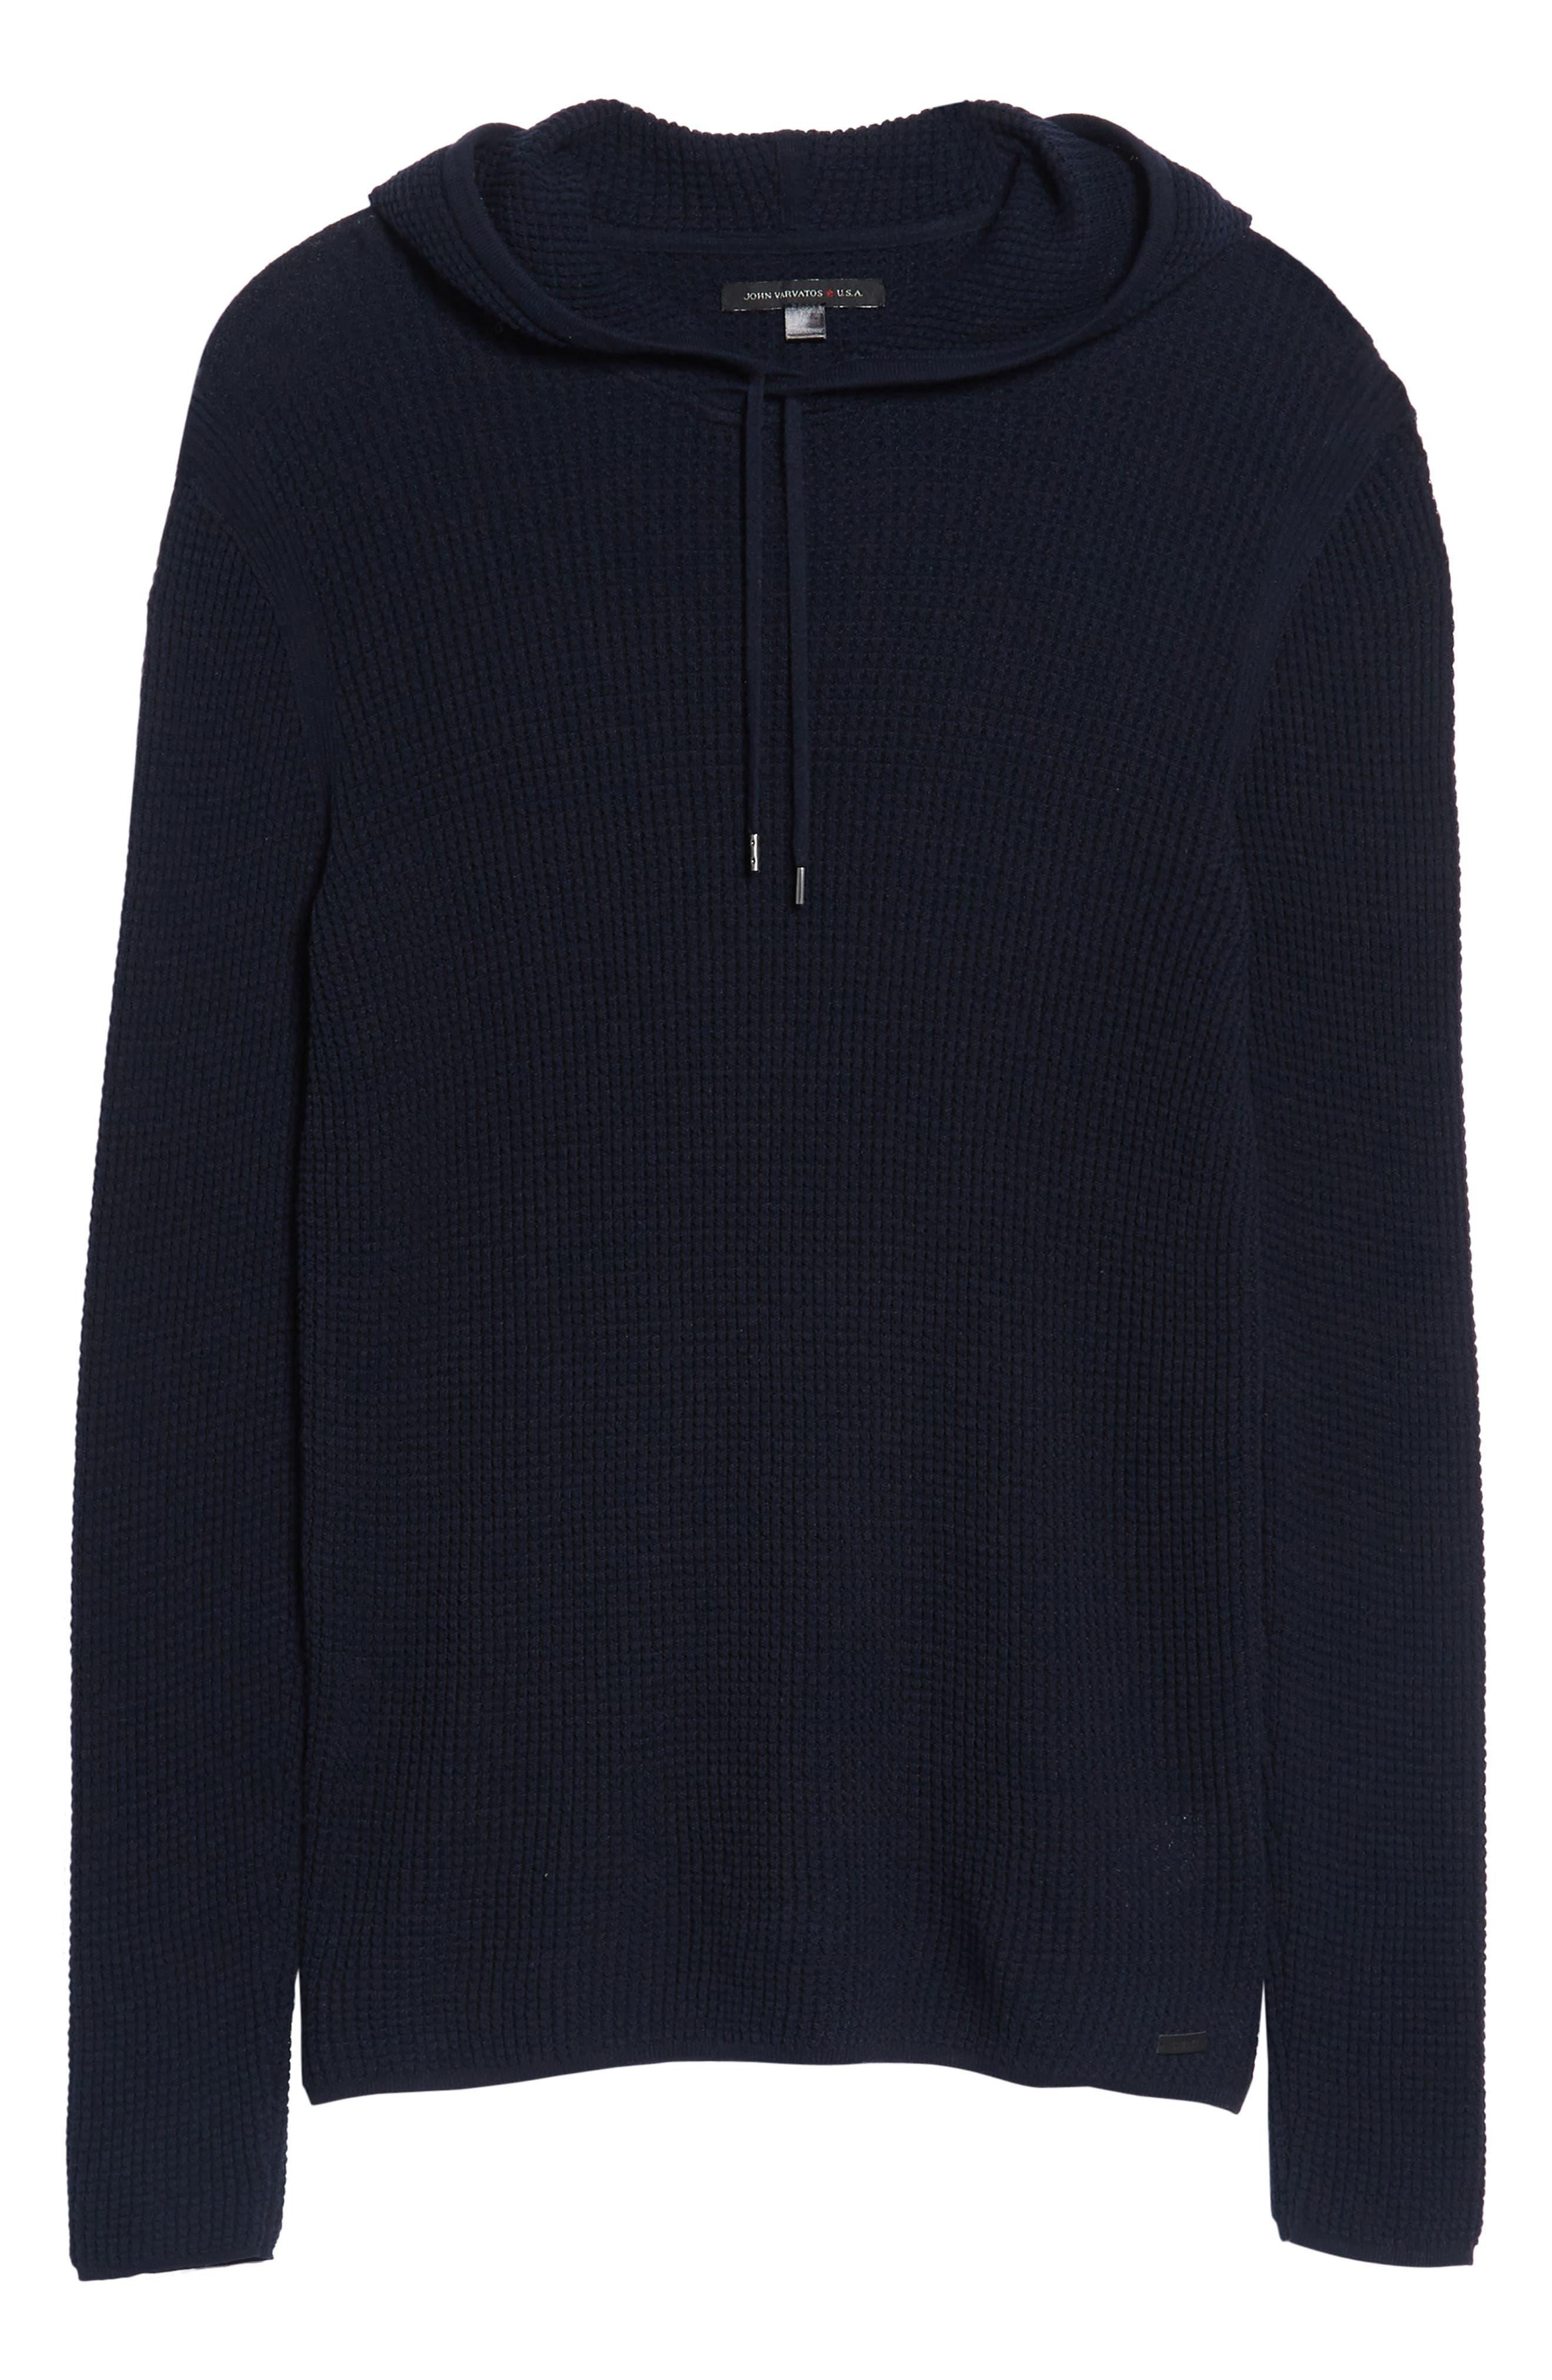 Thermal Pullover Hoodie,                             Alternate thumbnail 6, color,                             Marine